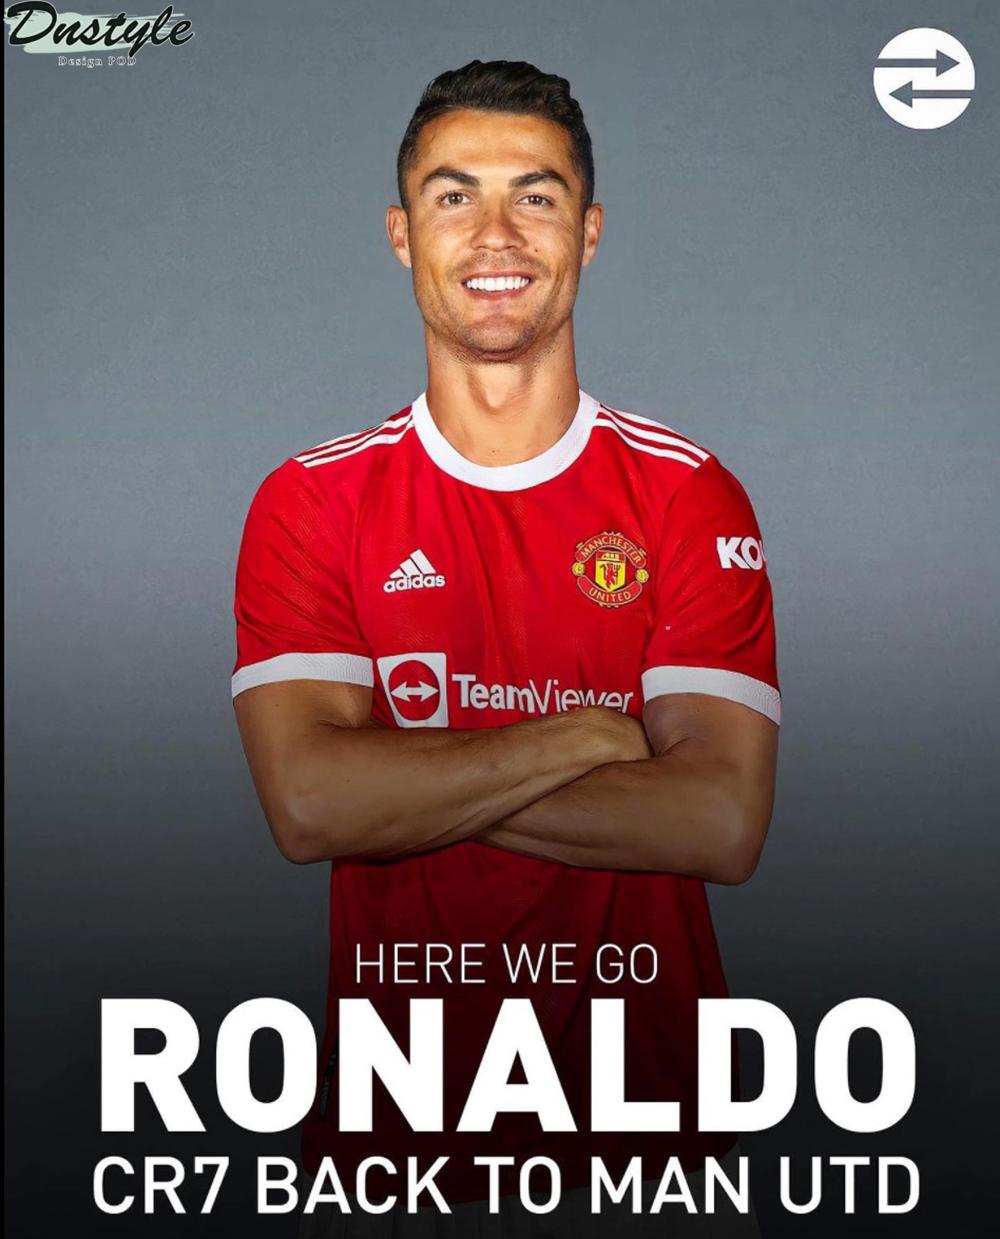 CR7 Ronaldo Man utd home kit 20-21